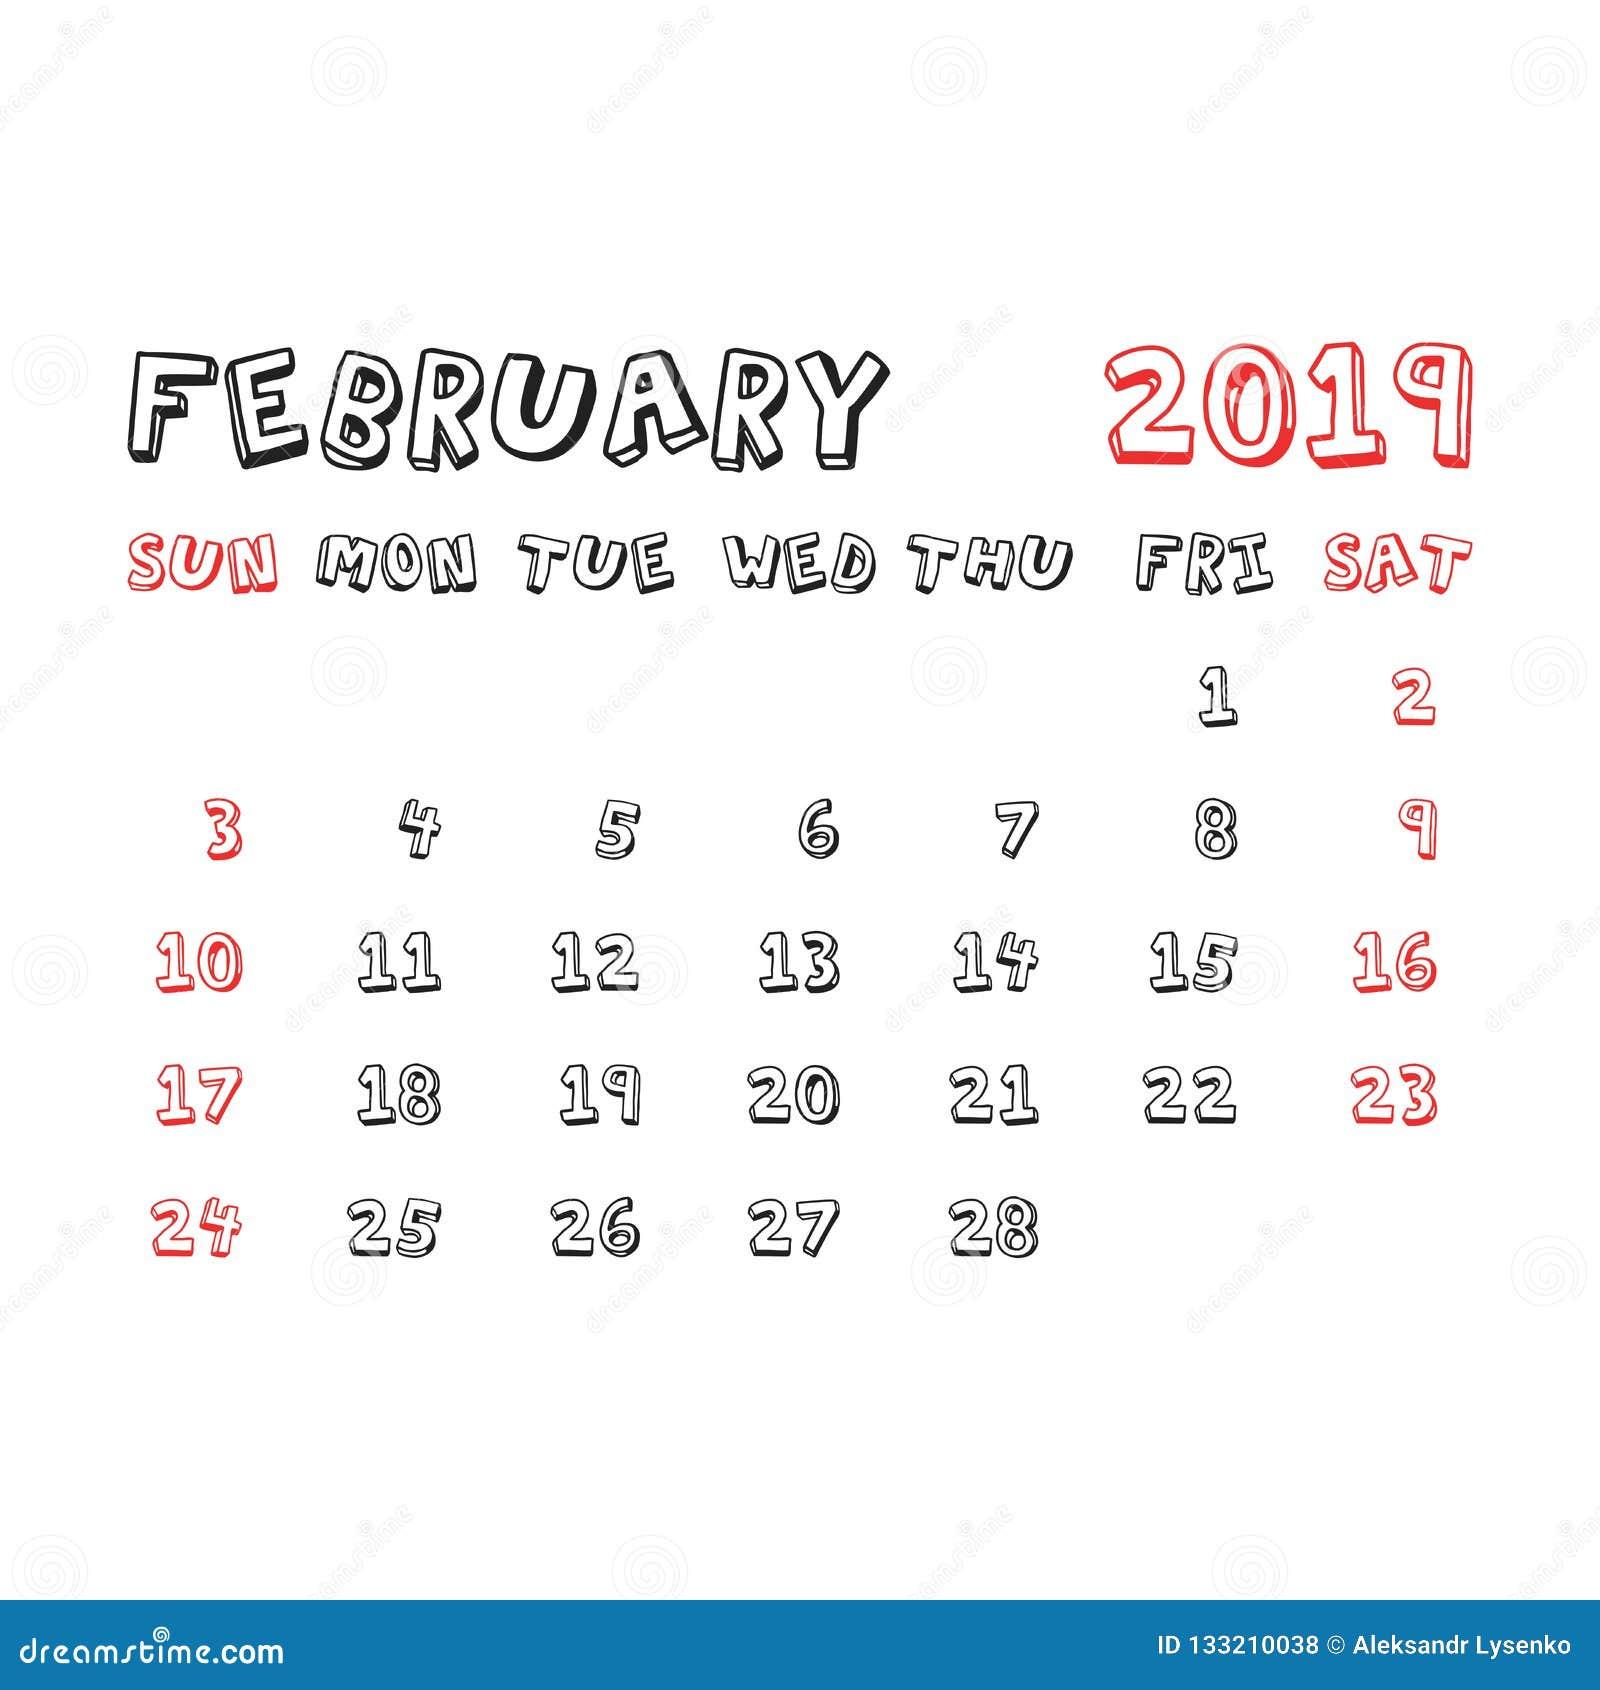 February 2019 Calendar Agenda Calendar February 2019 Year In Cartoon Child Style. Calendar